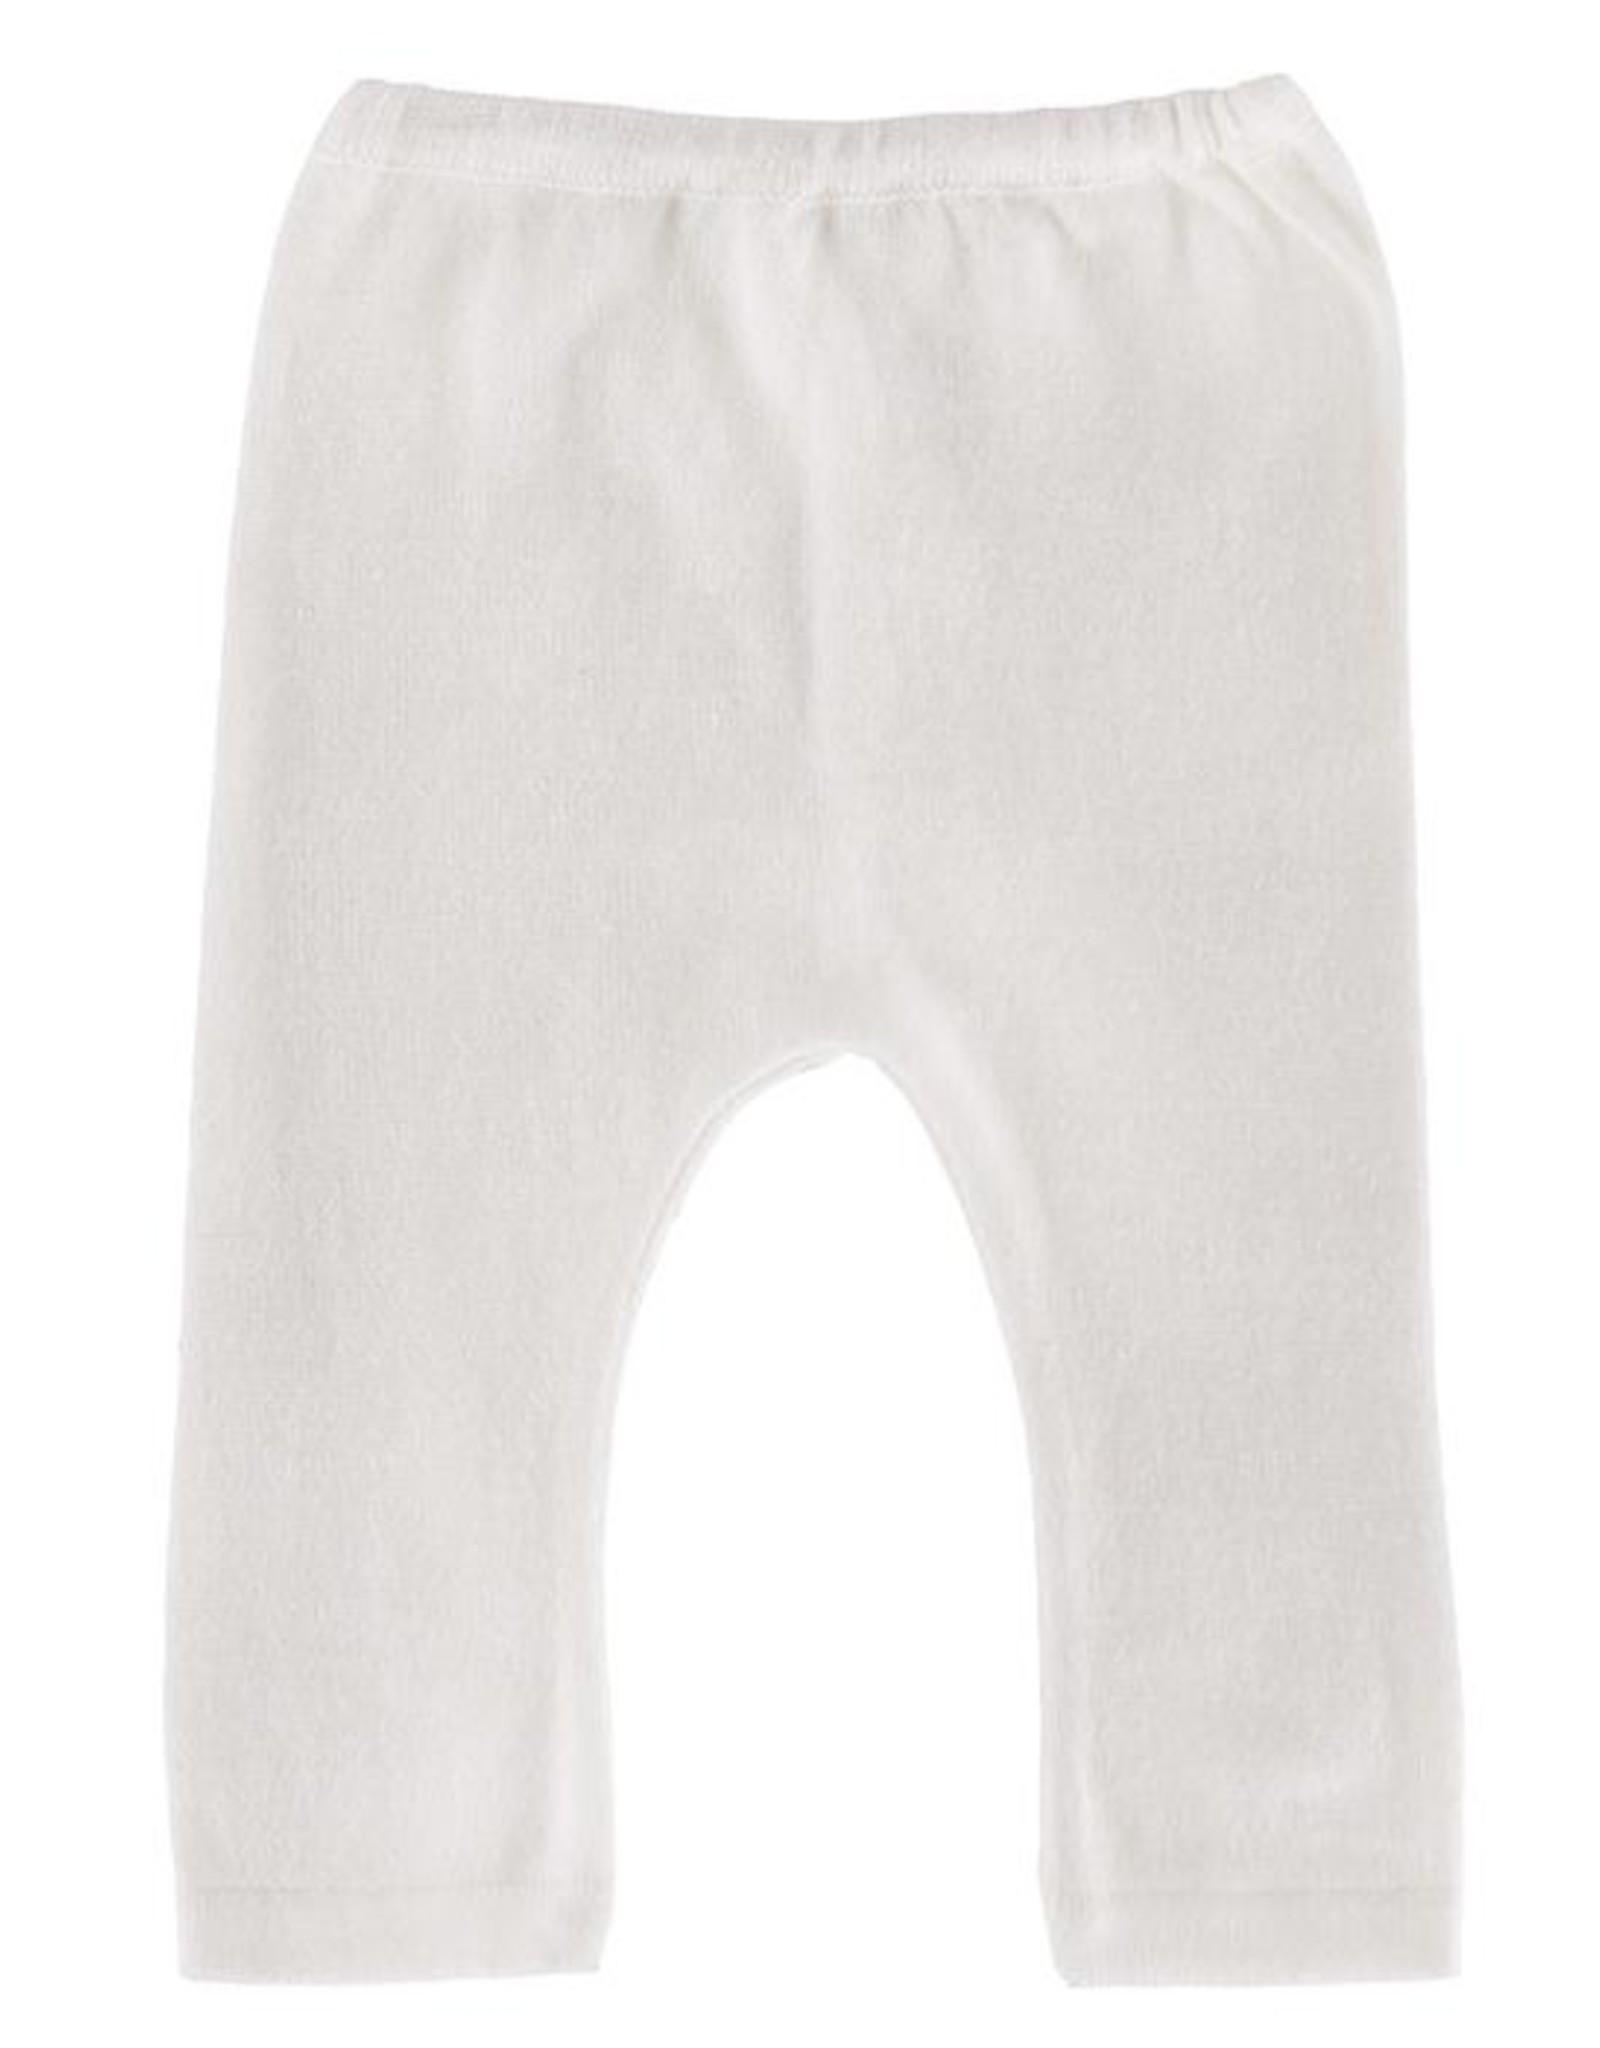 Pequeno Tocon Pantalon doux